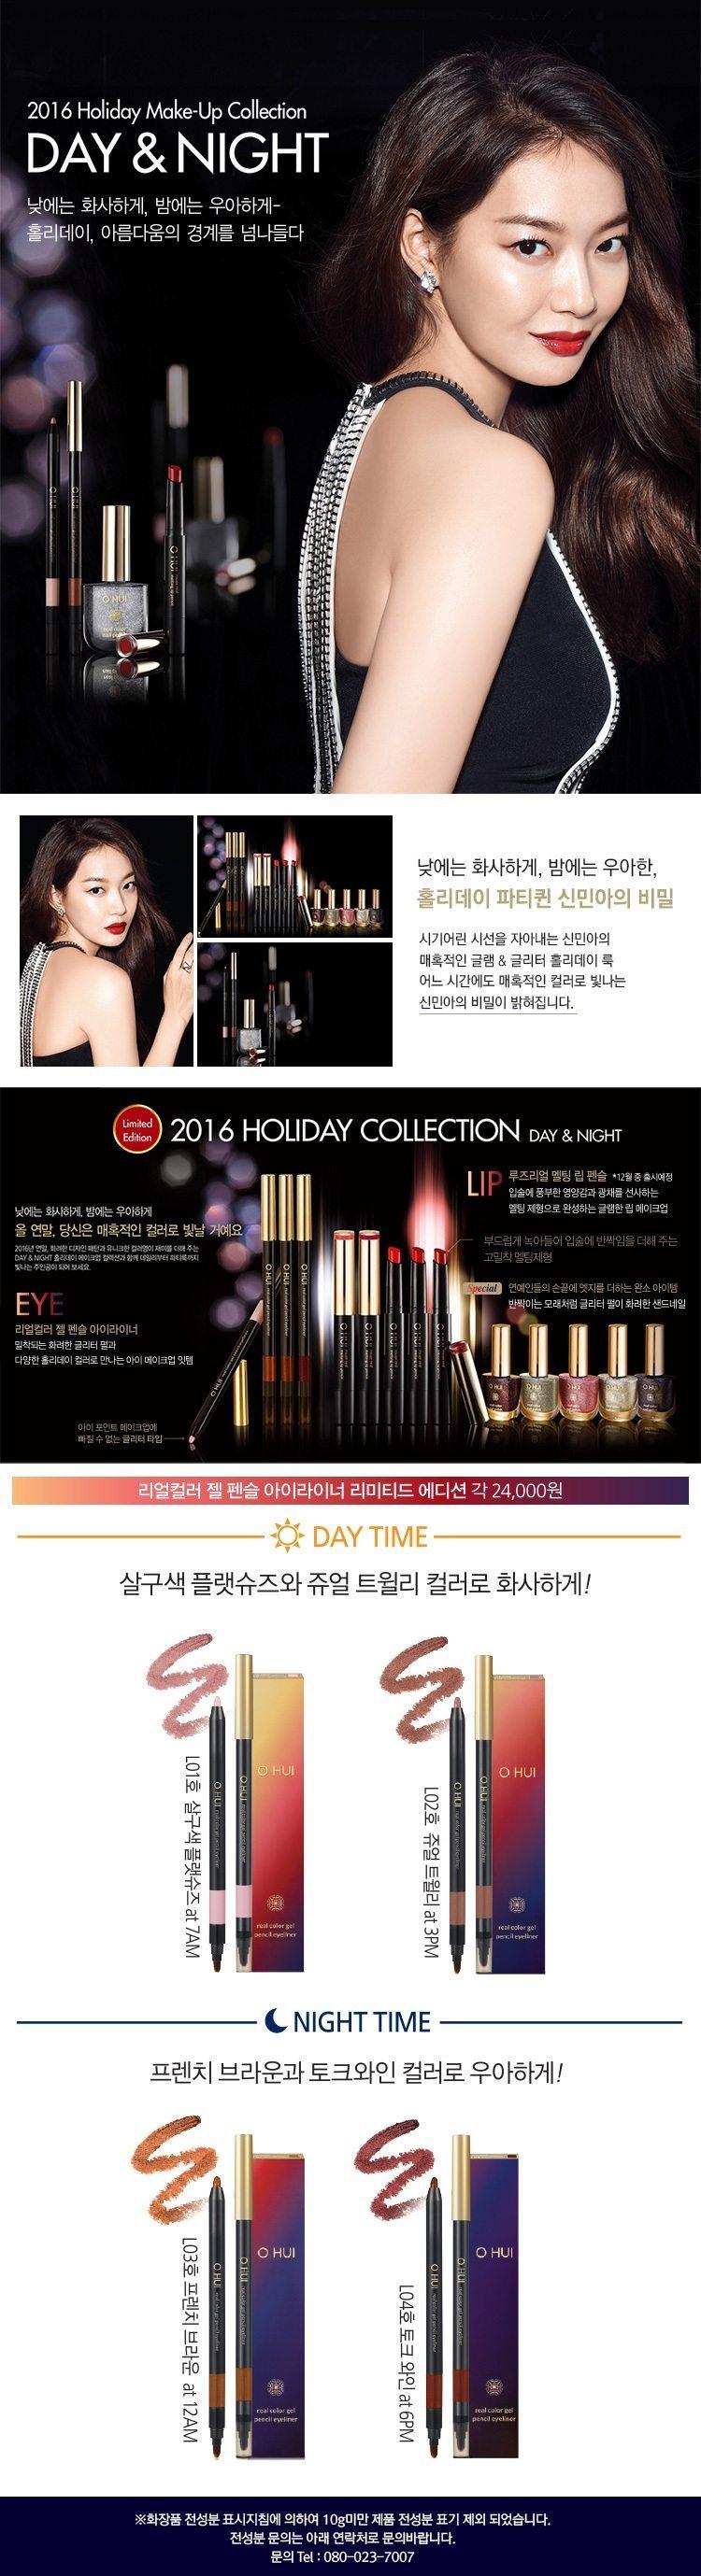 O Hui Real Color Gel Pencil Eyeliner korean cosmetic makeup product online shop malaysia japan taiwan1